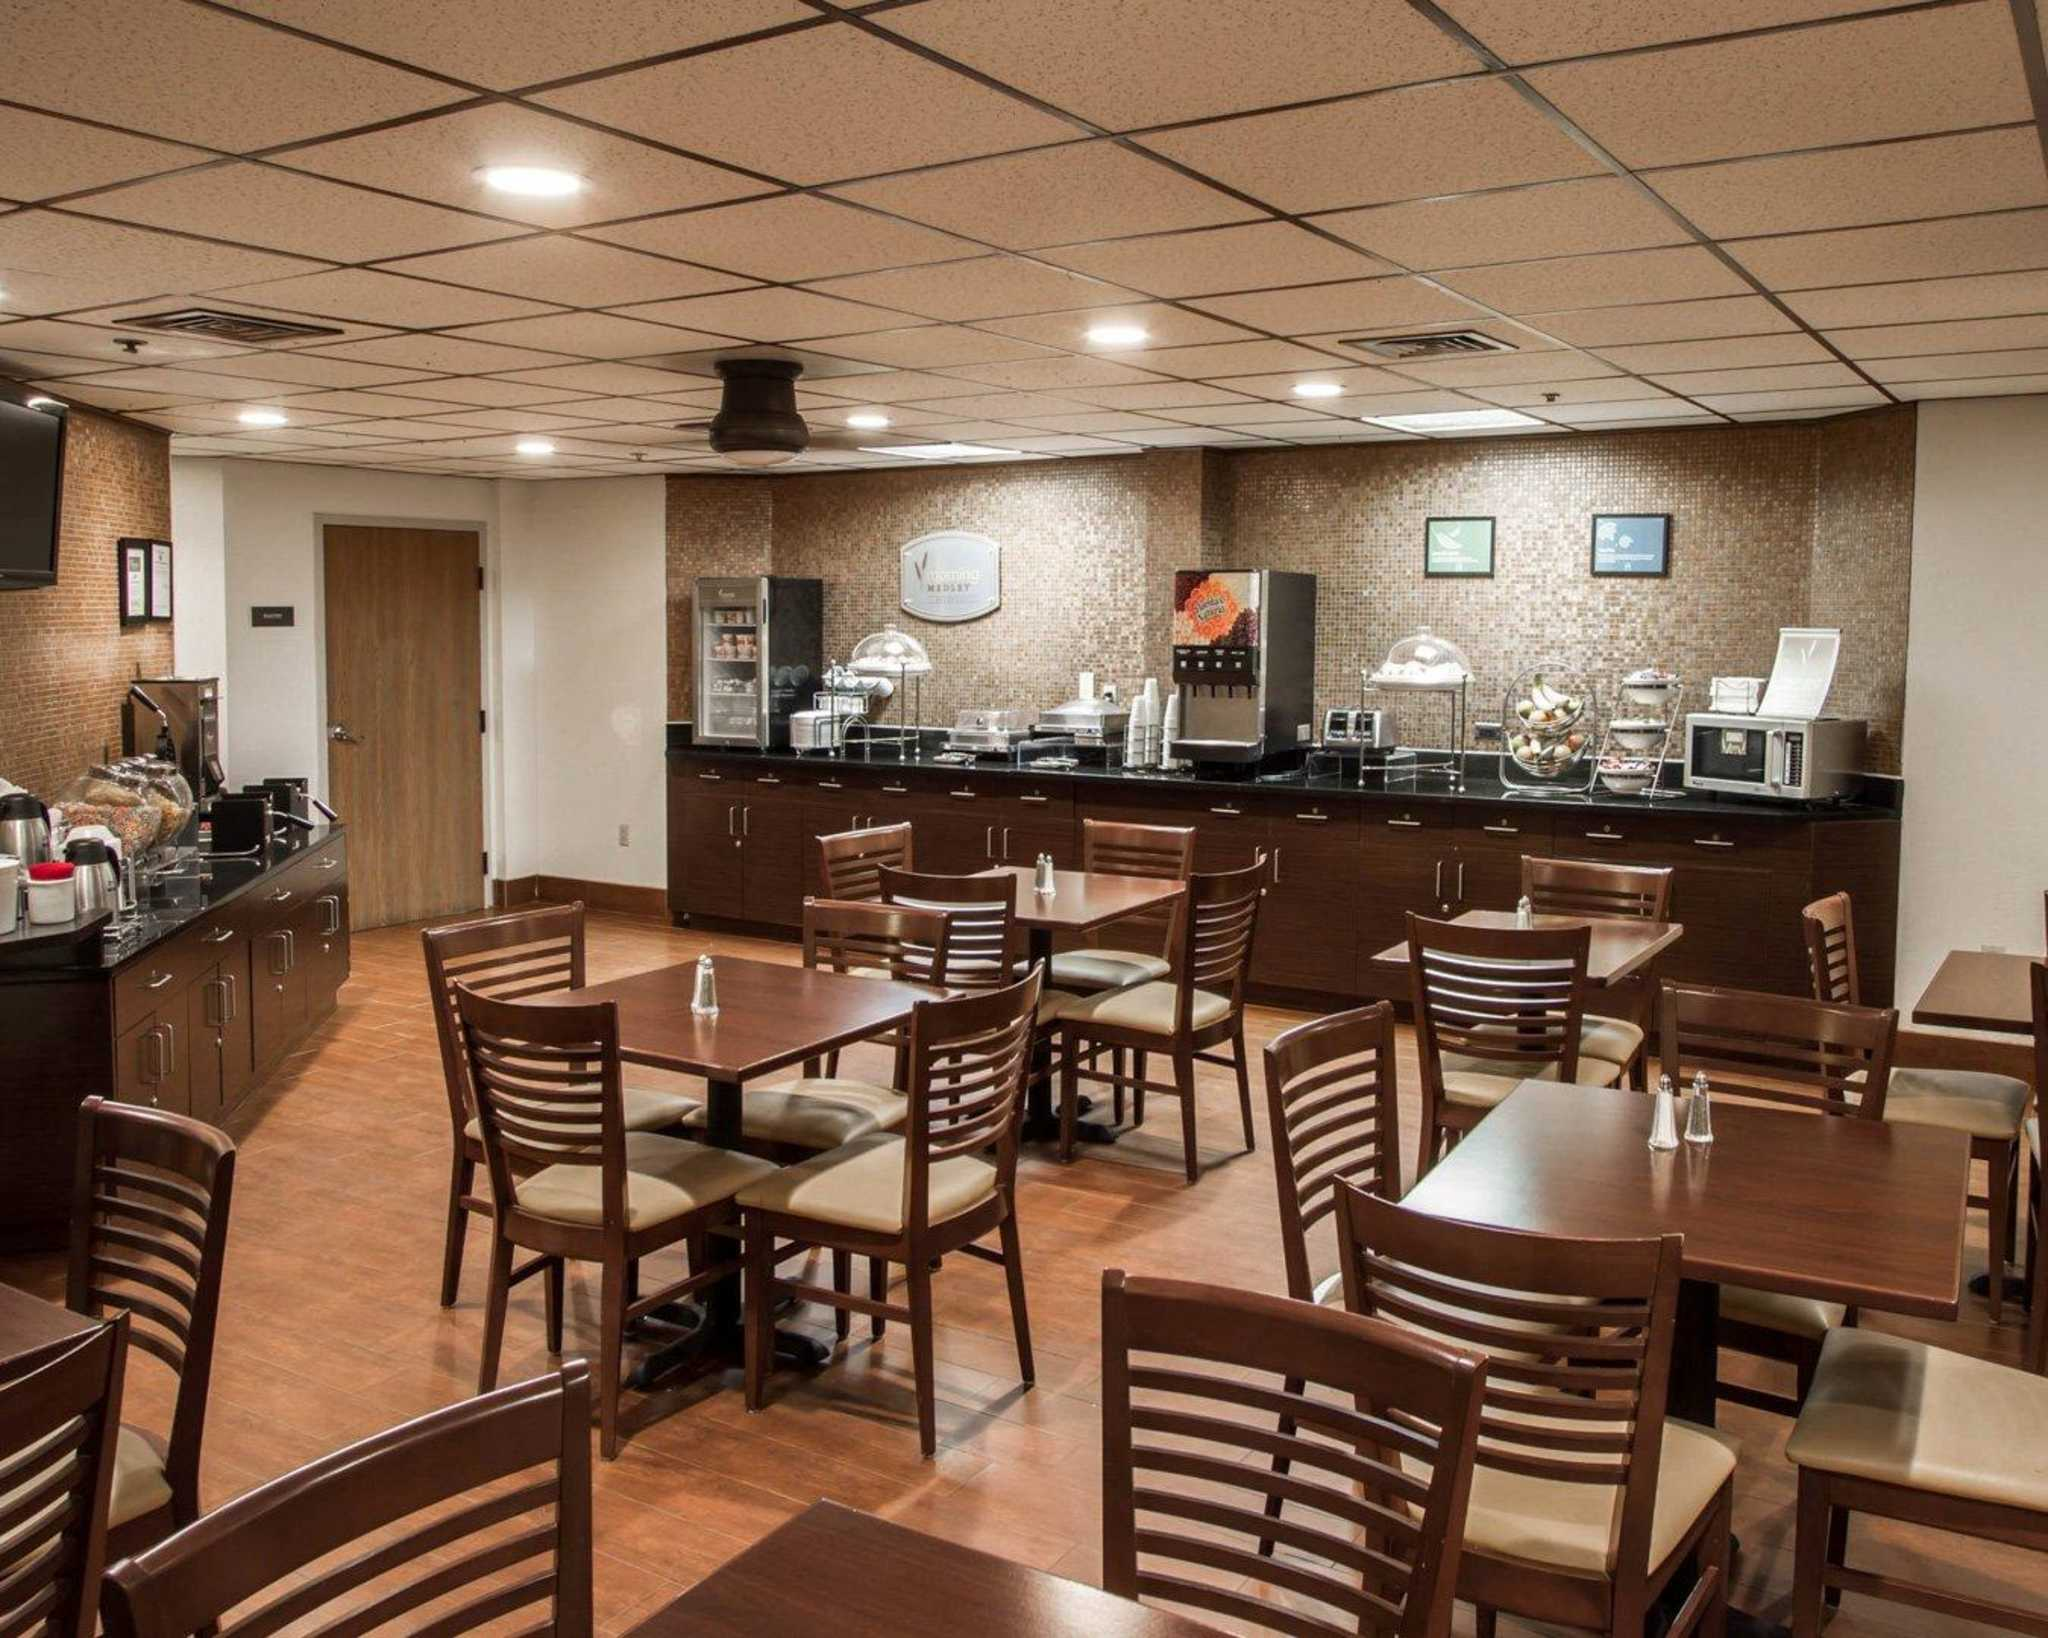 Sleep Inn & Suites Buffalo Airport image 21